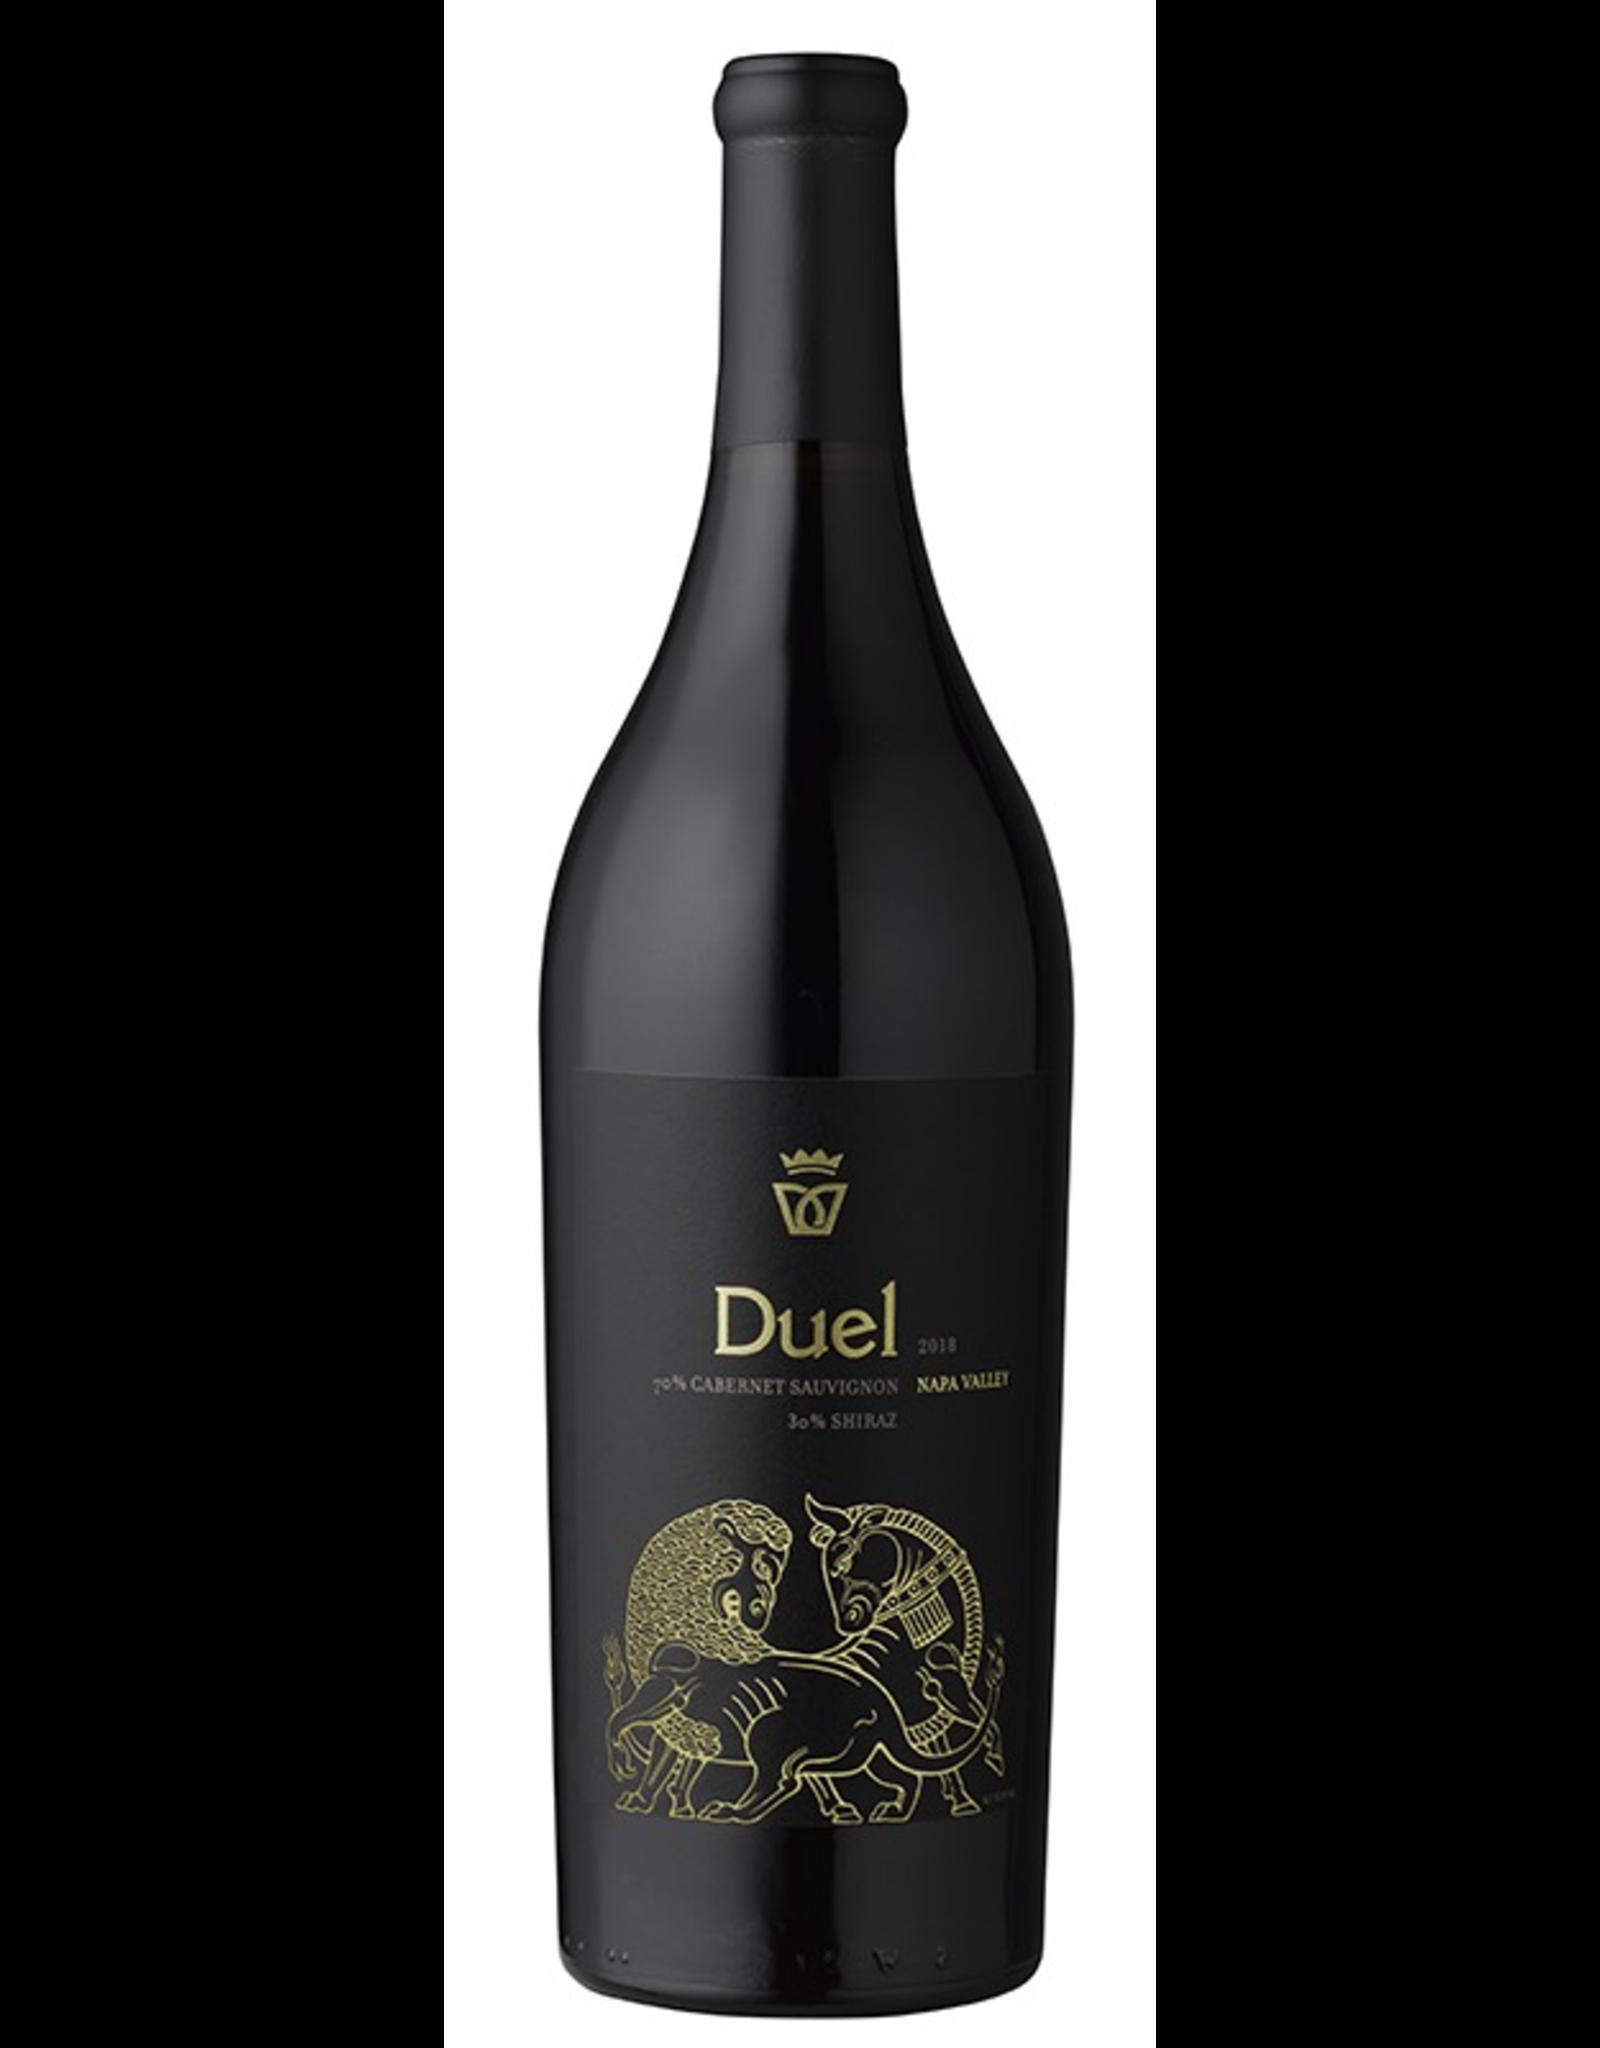 Red Wine 2018, Duel by Darioush, Cabernet Shiraz Blend, Napa, Napa Valley, California, 15.9% Alc, CTnr